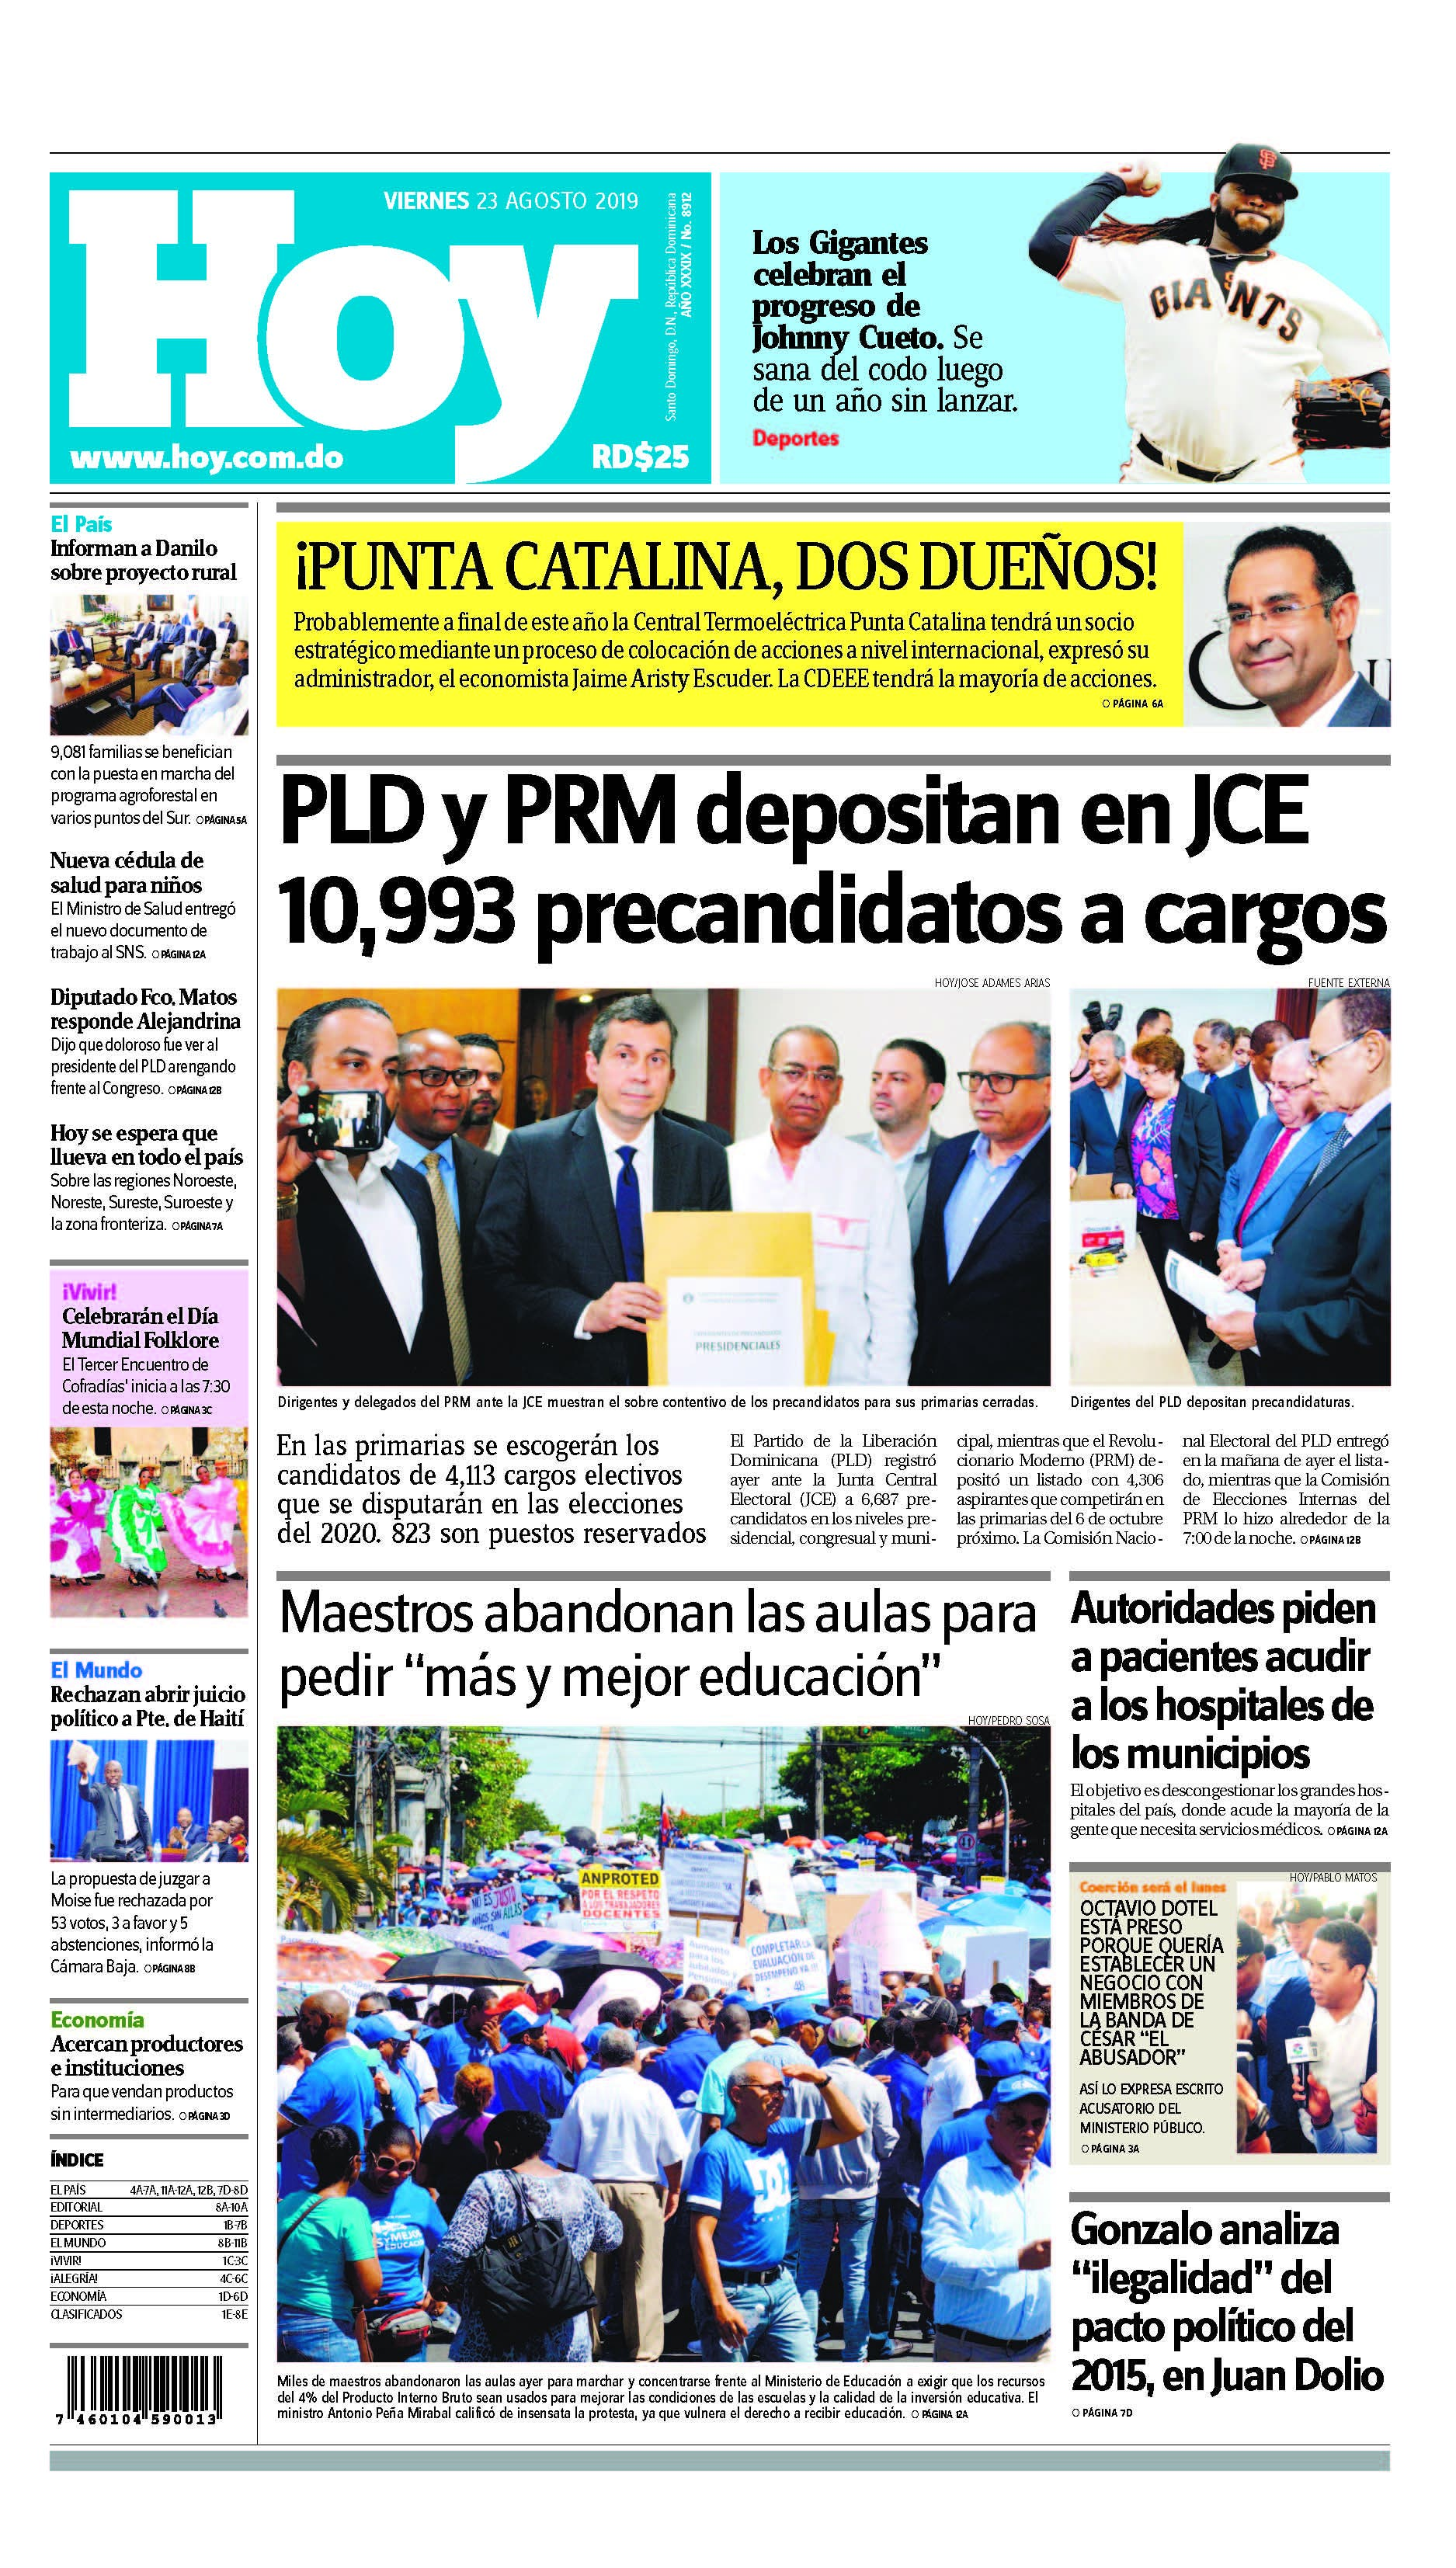 Pages from 23_08_2019 HOY_VIERNES_230819_ El País1 A